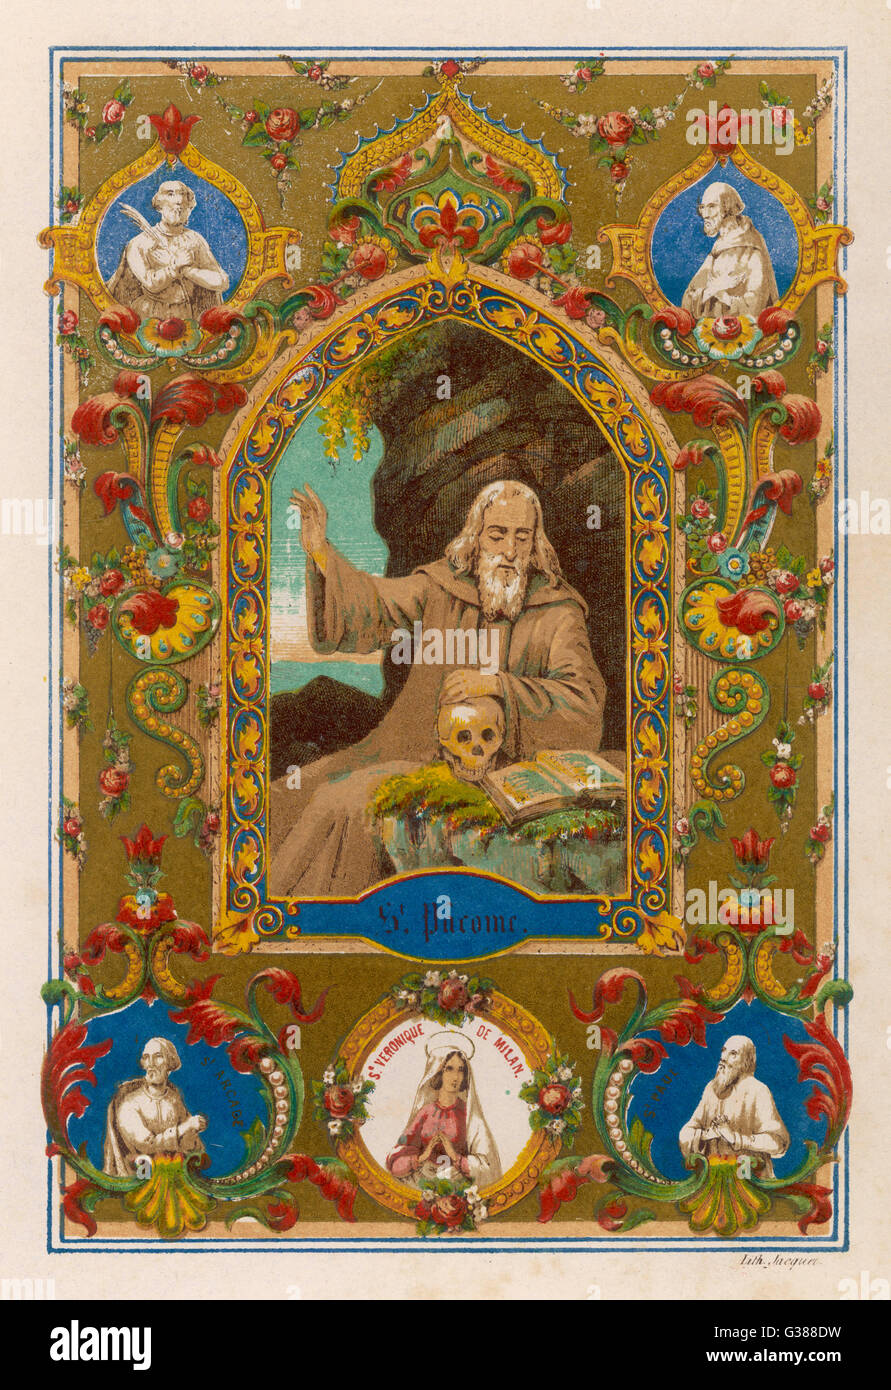 SAINT PACOMIUS  Greek founder of monastic  communities       Date: 292 - 348 - Stock Image